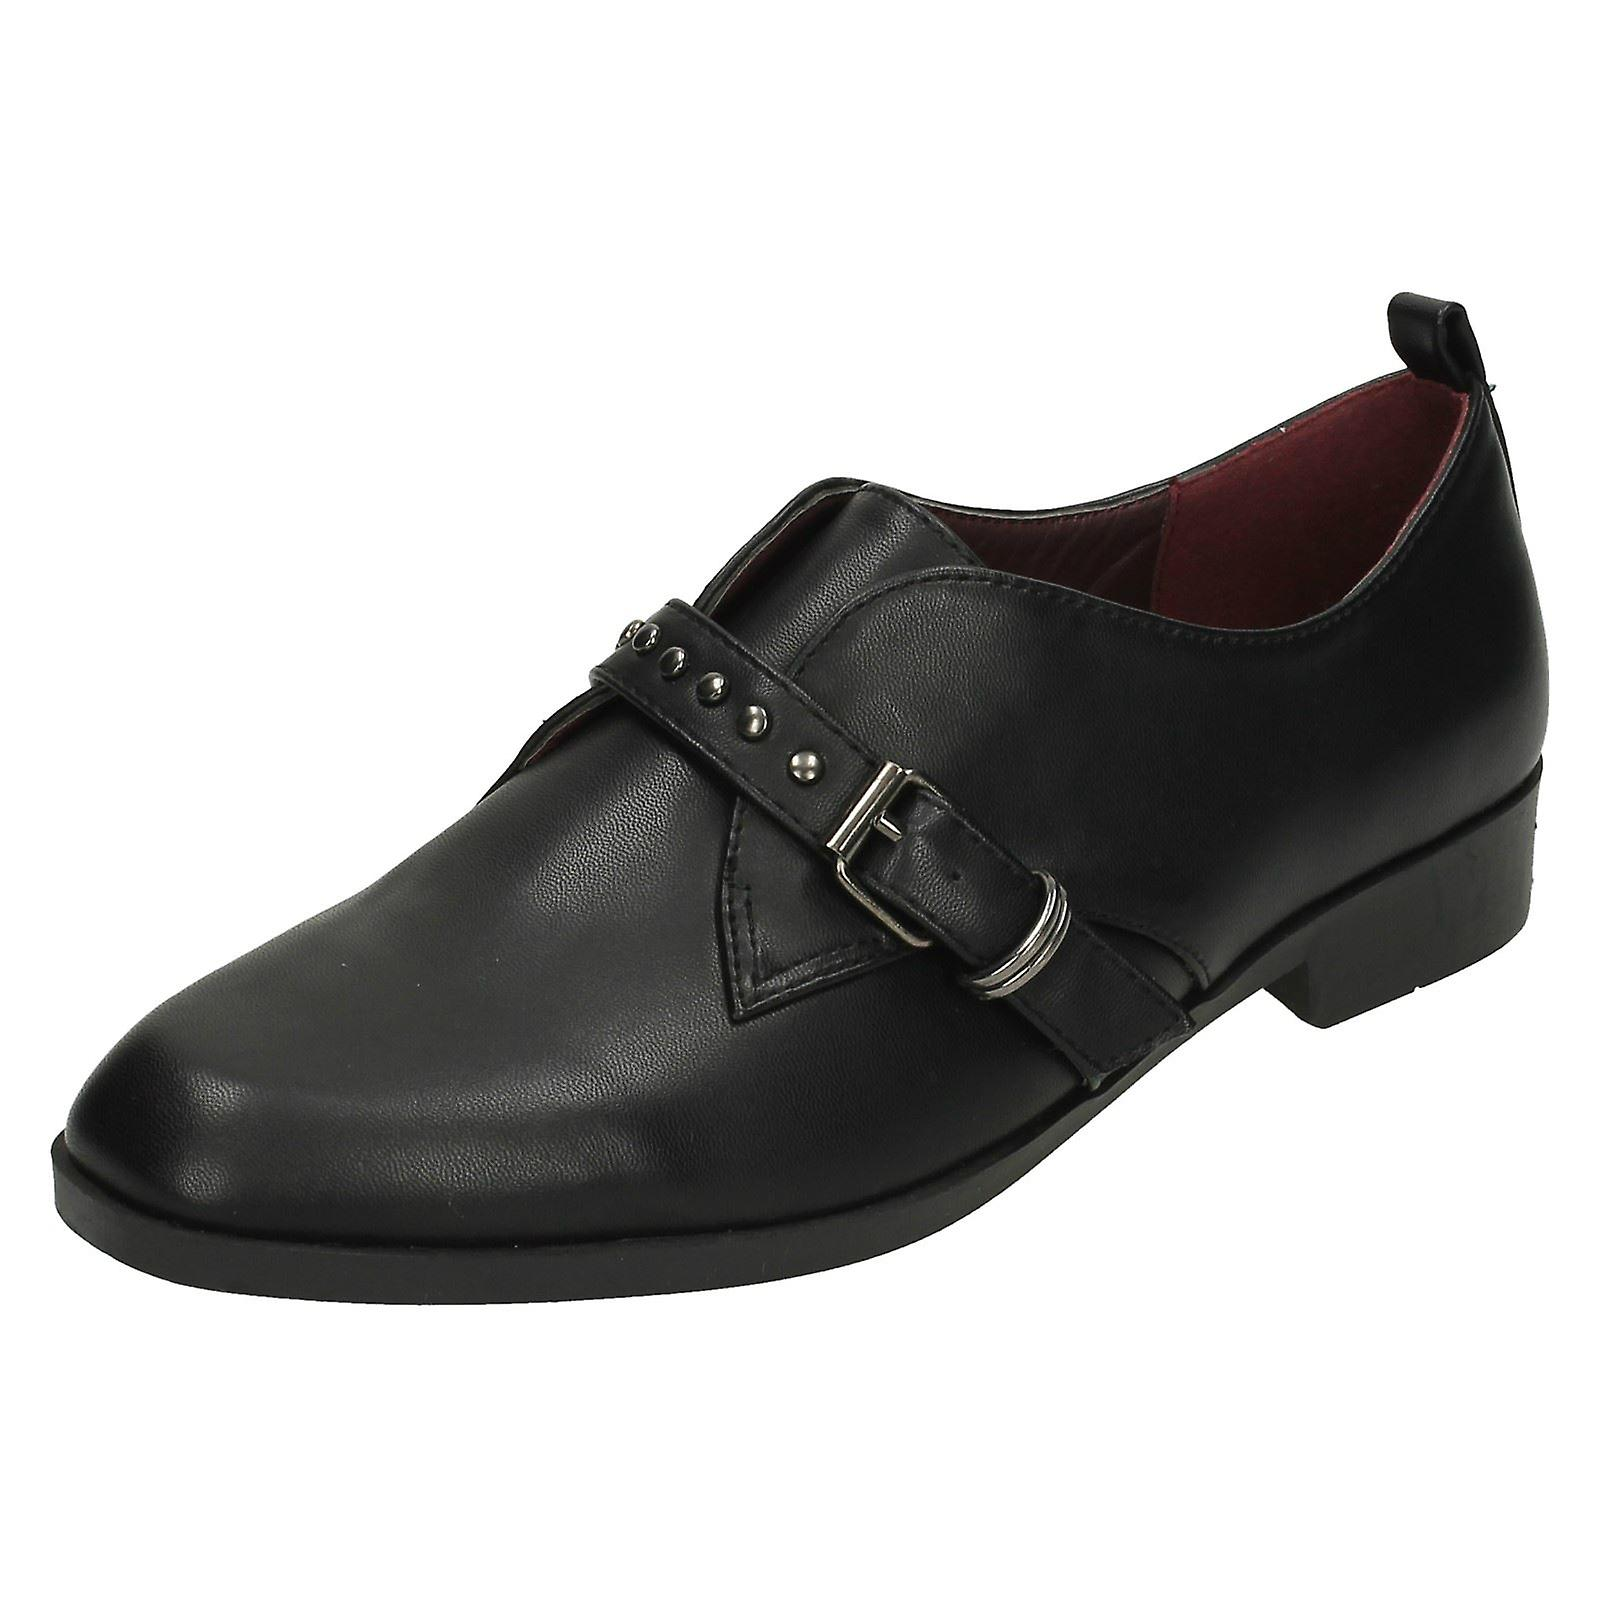 869dd3ec6737 Ladies Spot On Low Heel Buckle Strap Vamp Shoes F80196